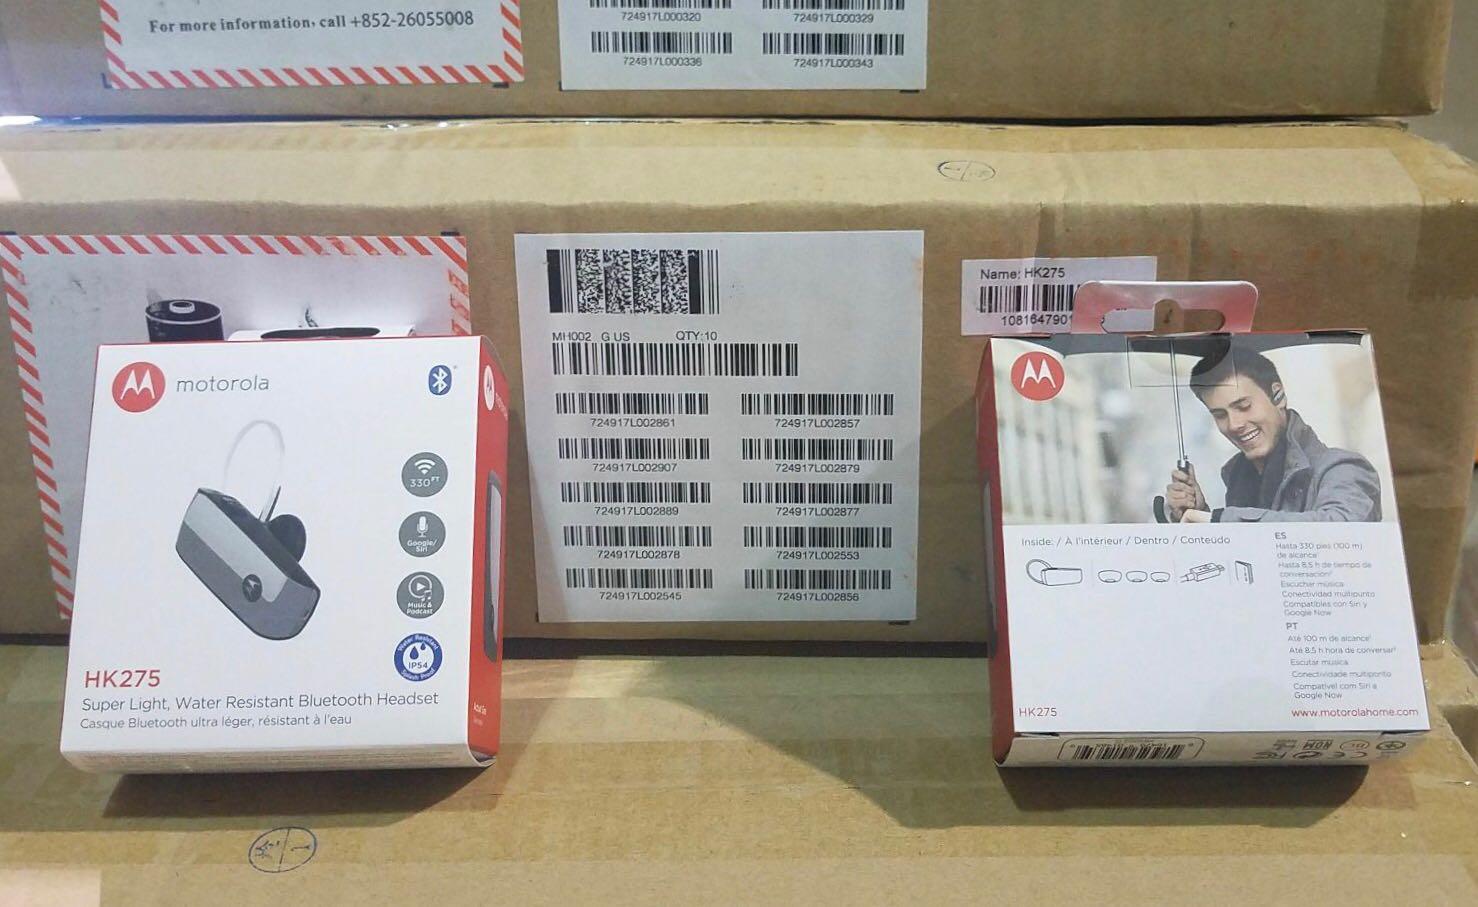 ??NOW IN STOCK @GLi MOTOROLA HK275 BLUETOOTH HEADSET??